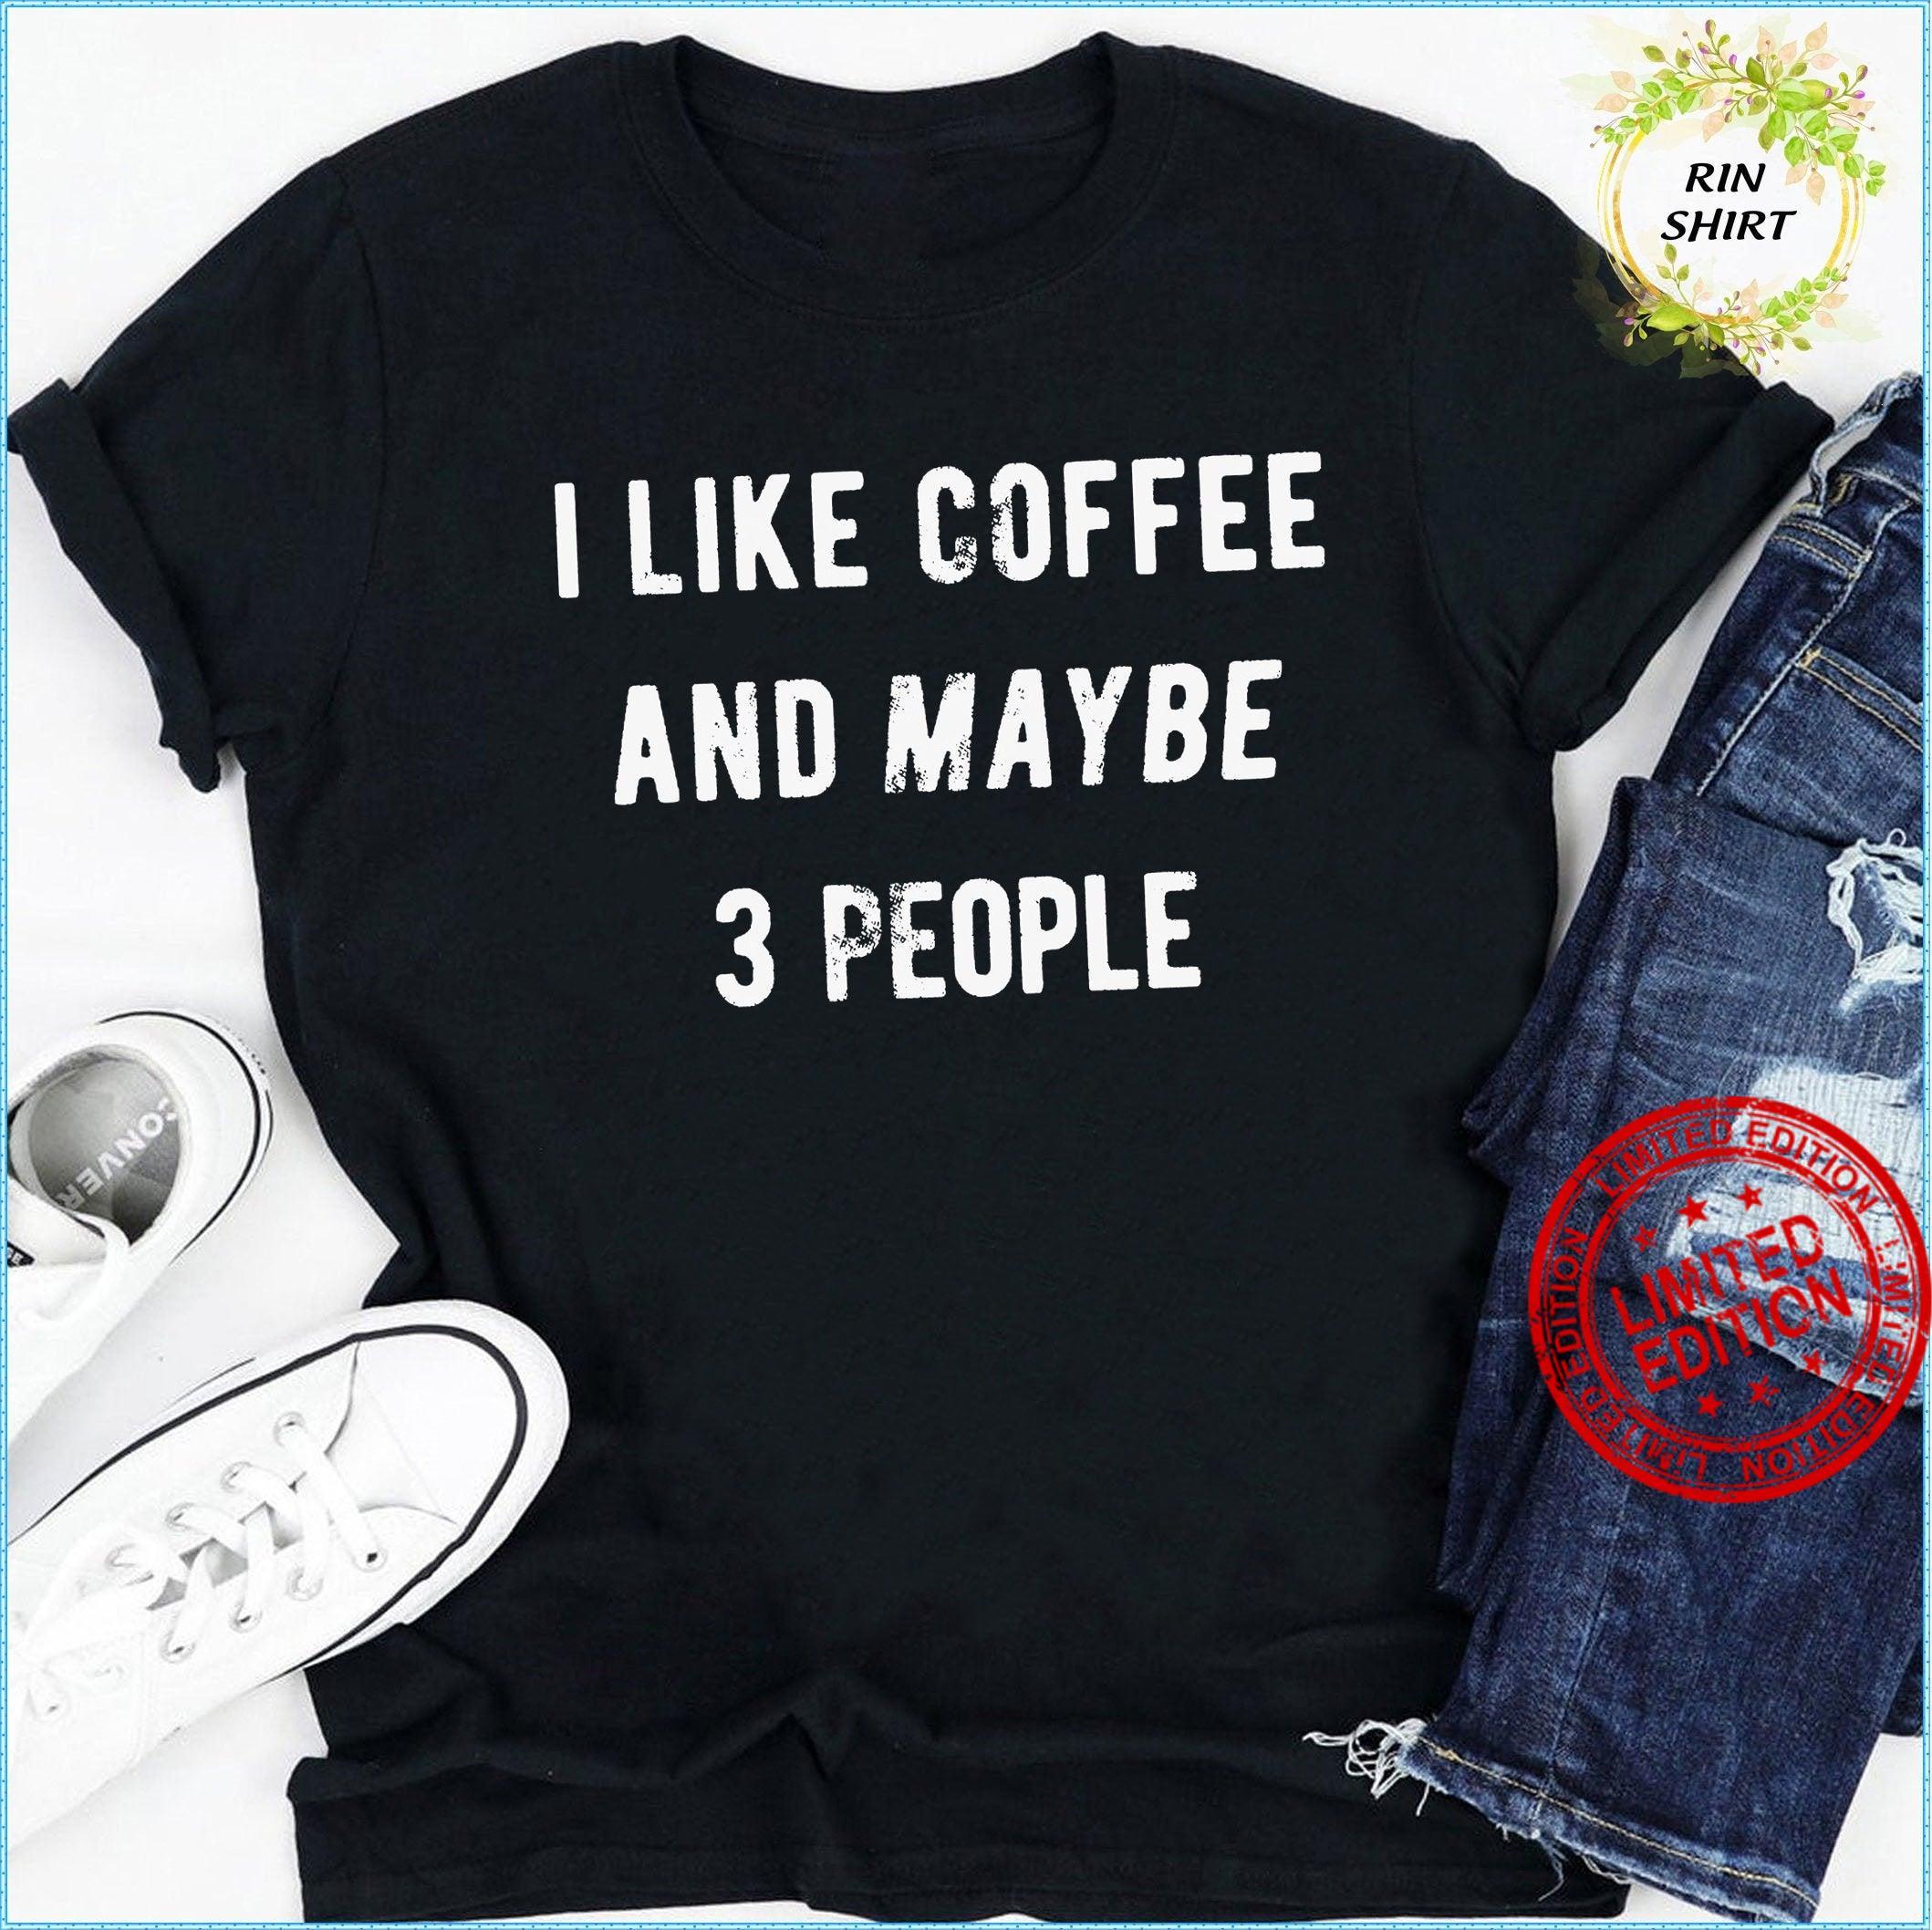 New Funny Coffee Women Shirt